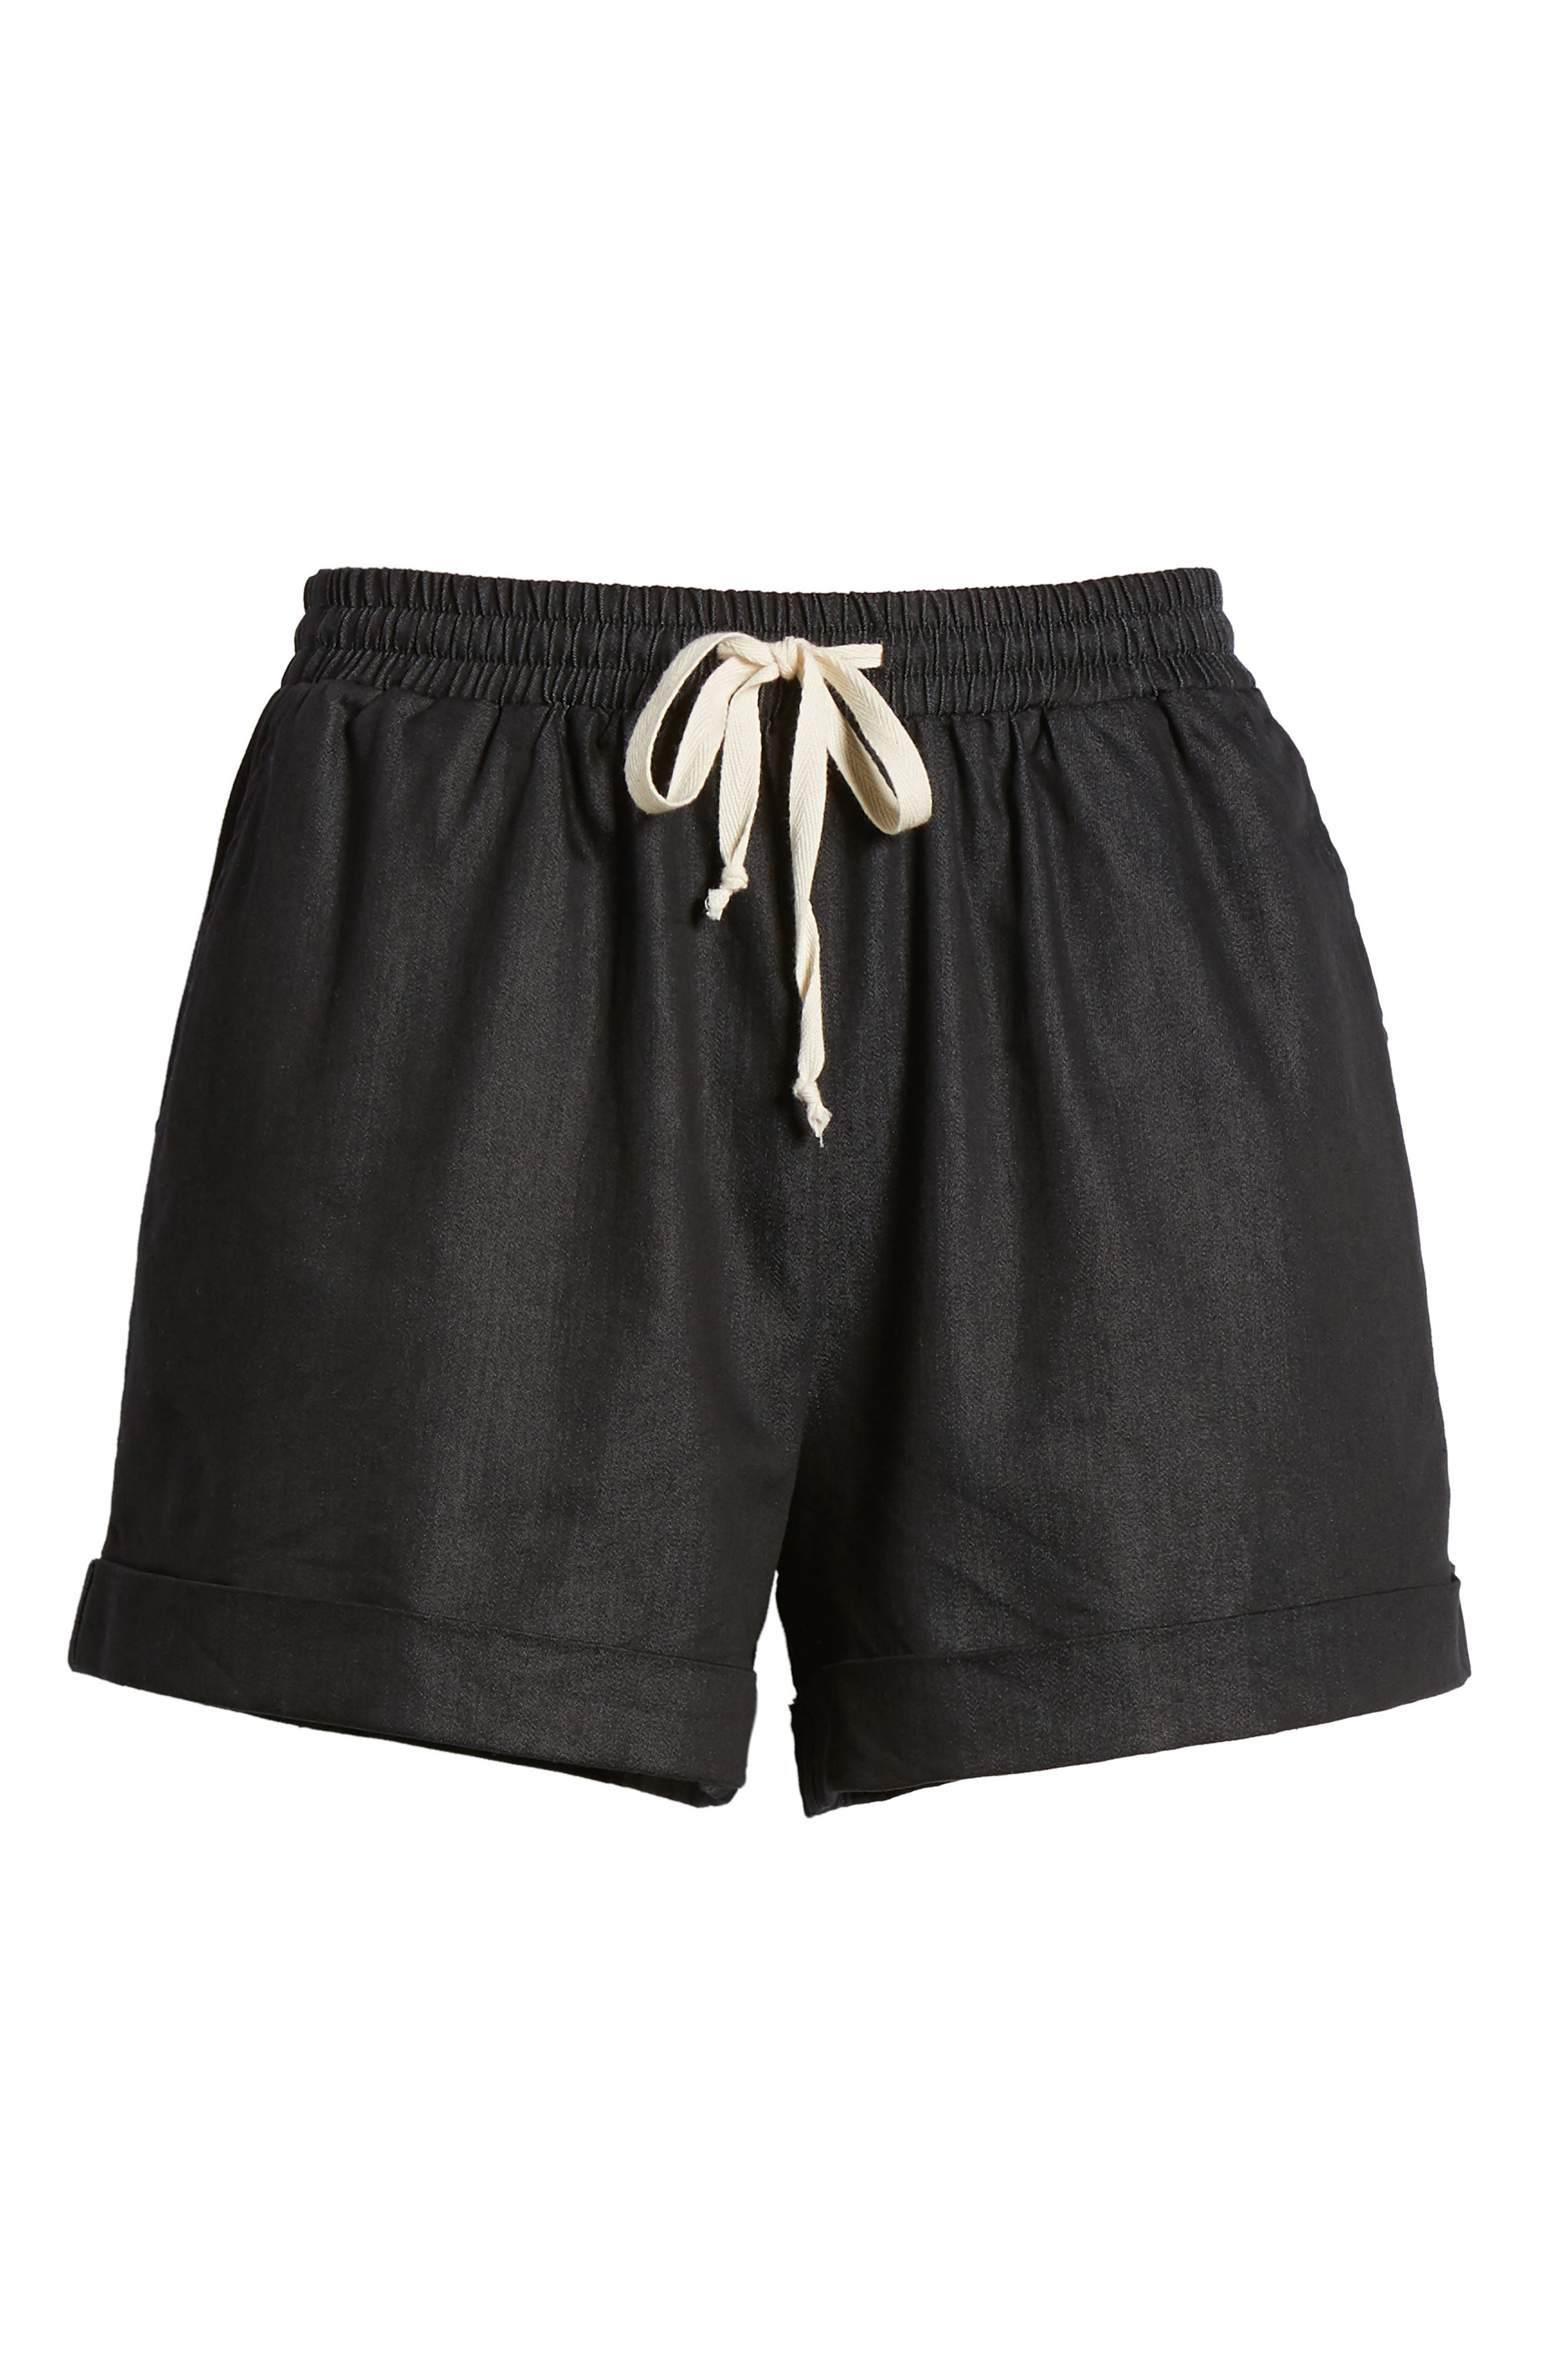 Getaway Shorts,                             Alternate thumbnail 7, color,                             Black